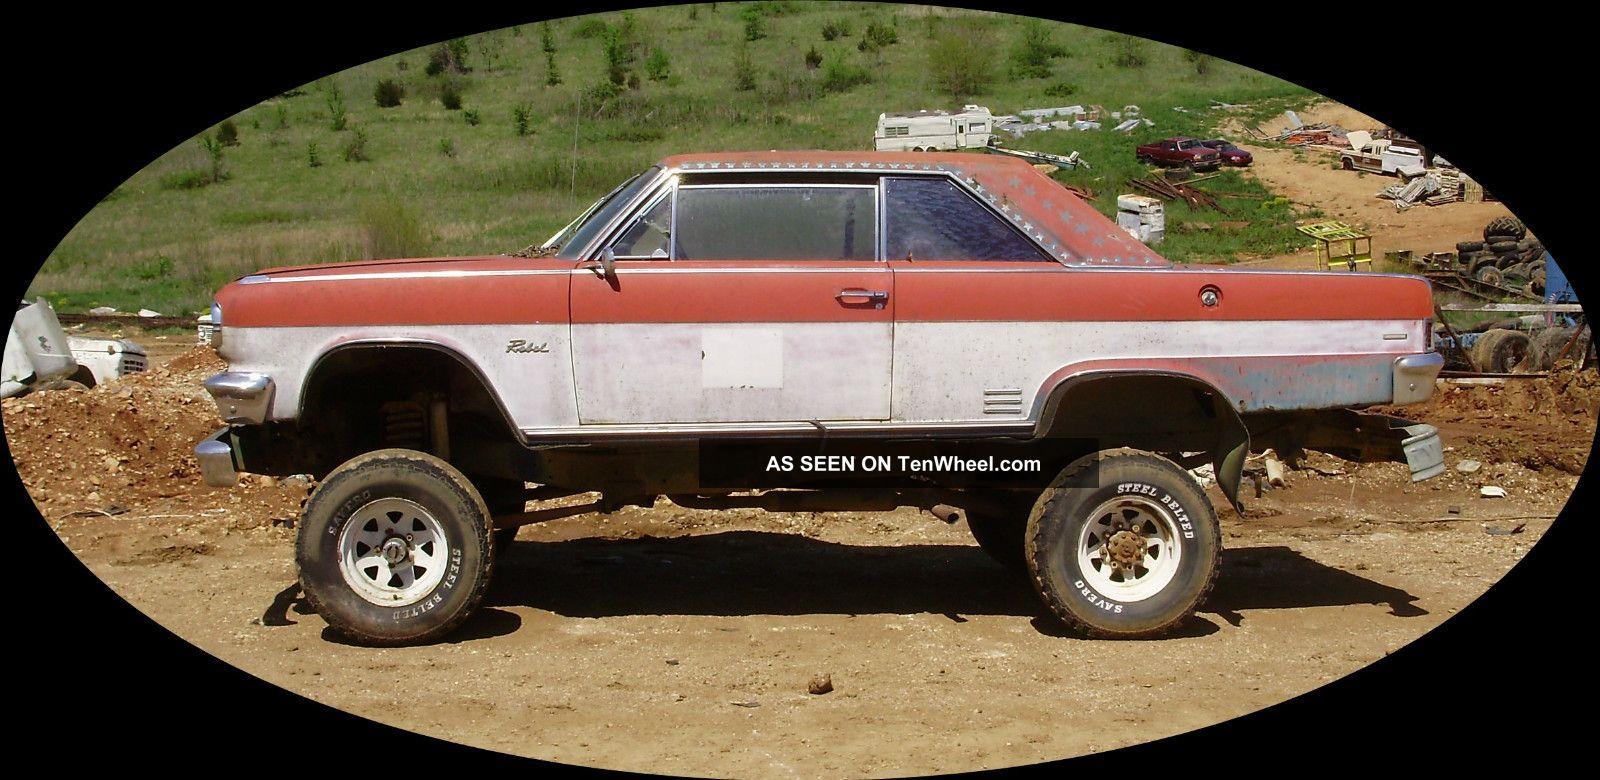 1966 Rambler Rebel Classic Rat Rod 4 Wheel Drive 1976 Ford Frame 390 Motor AMC photo